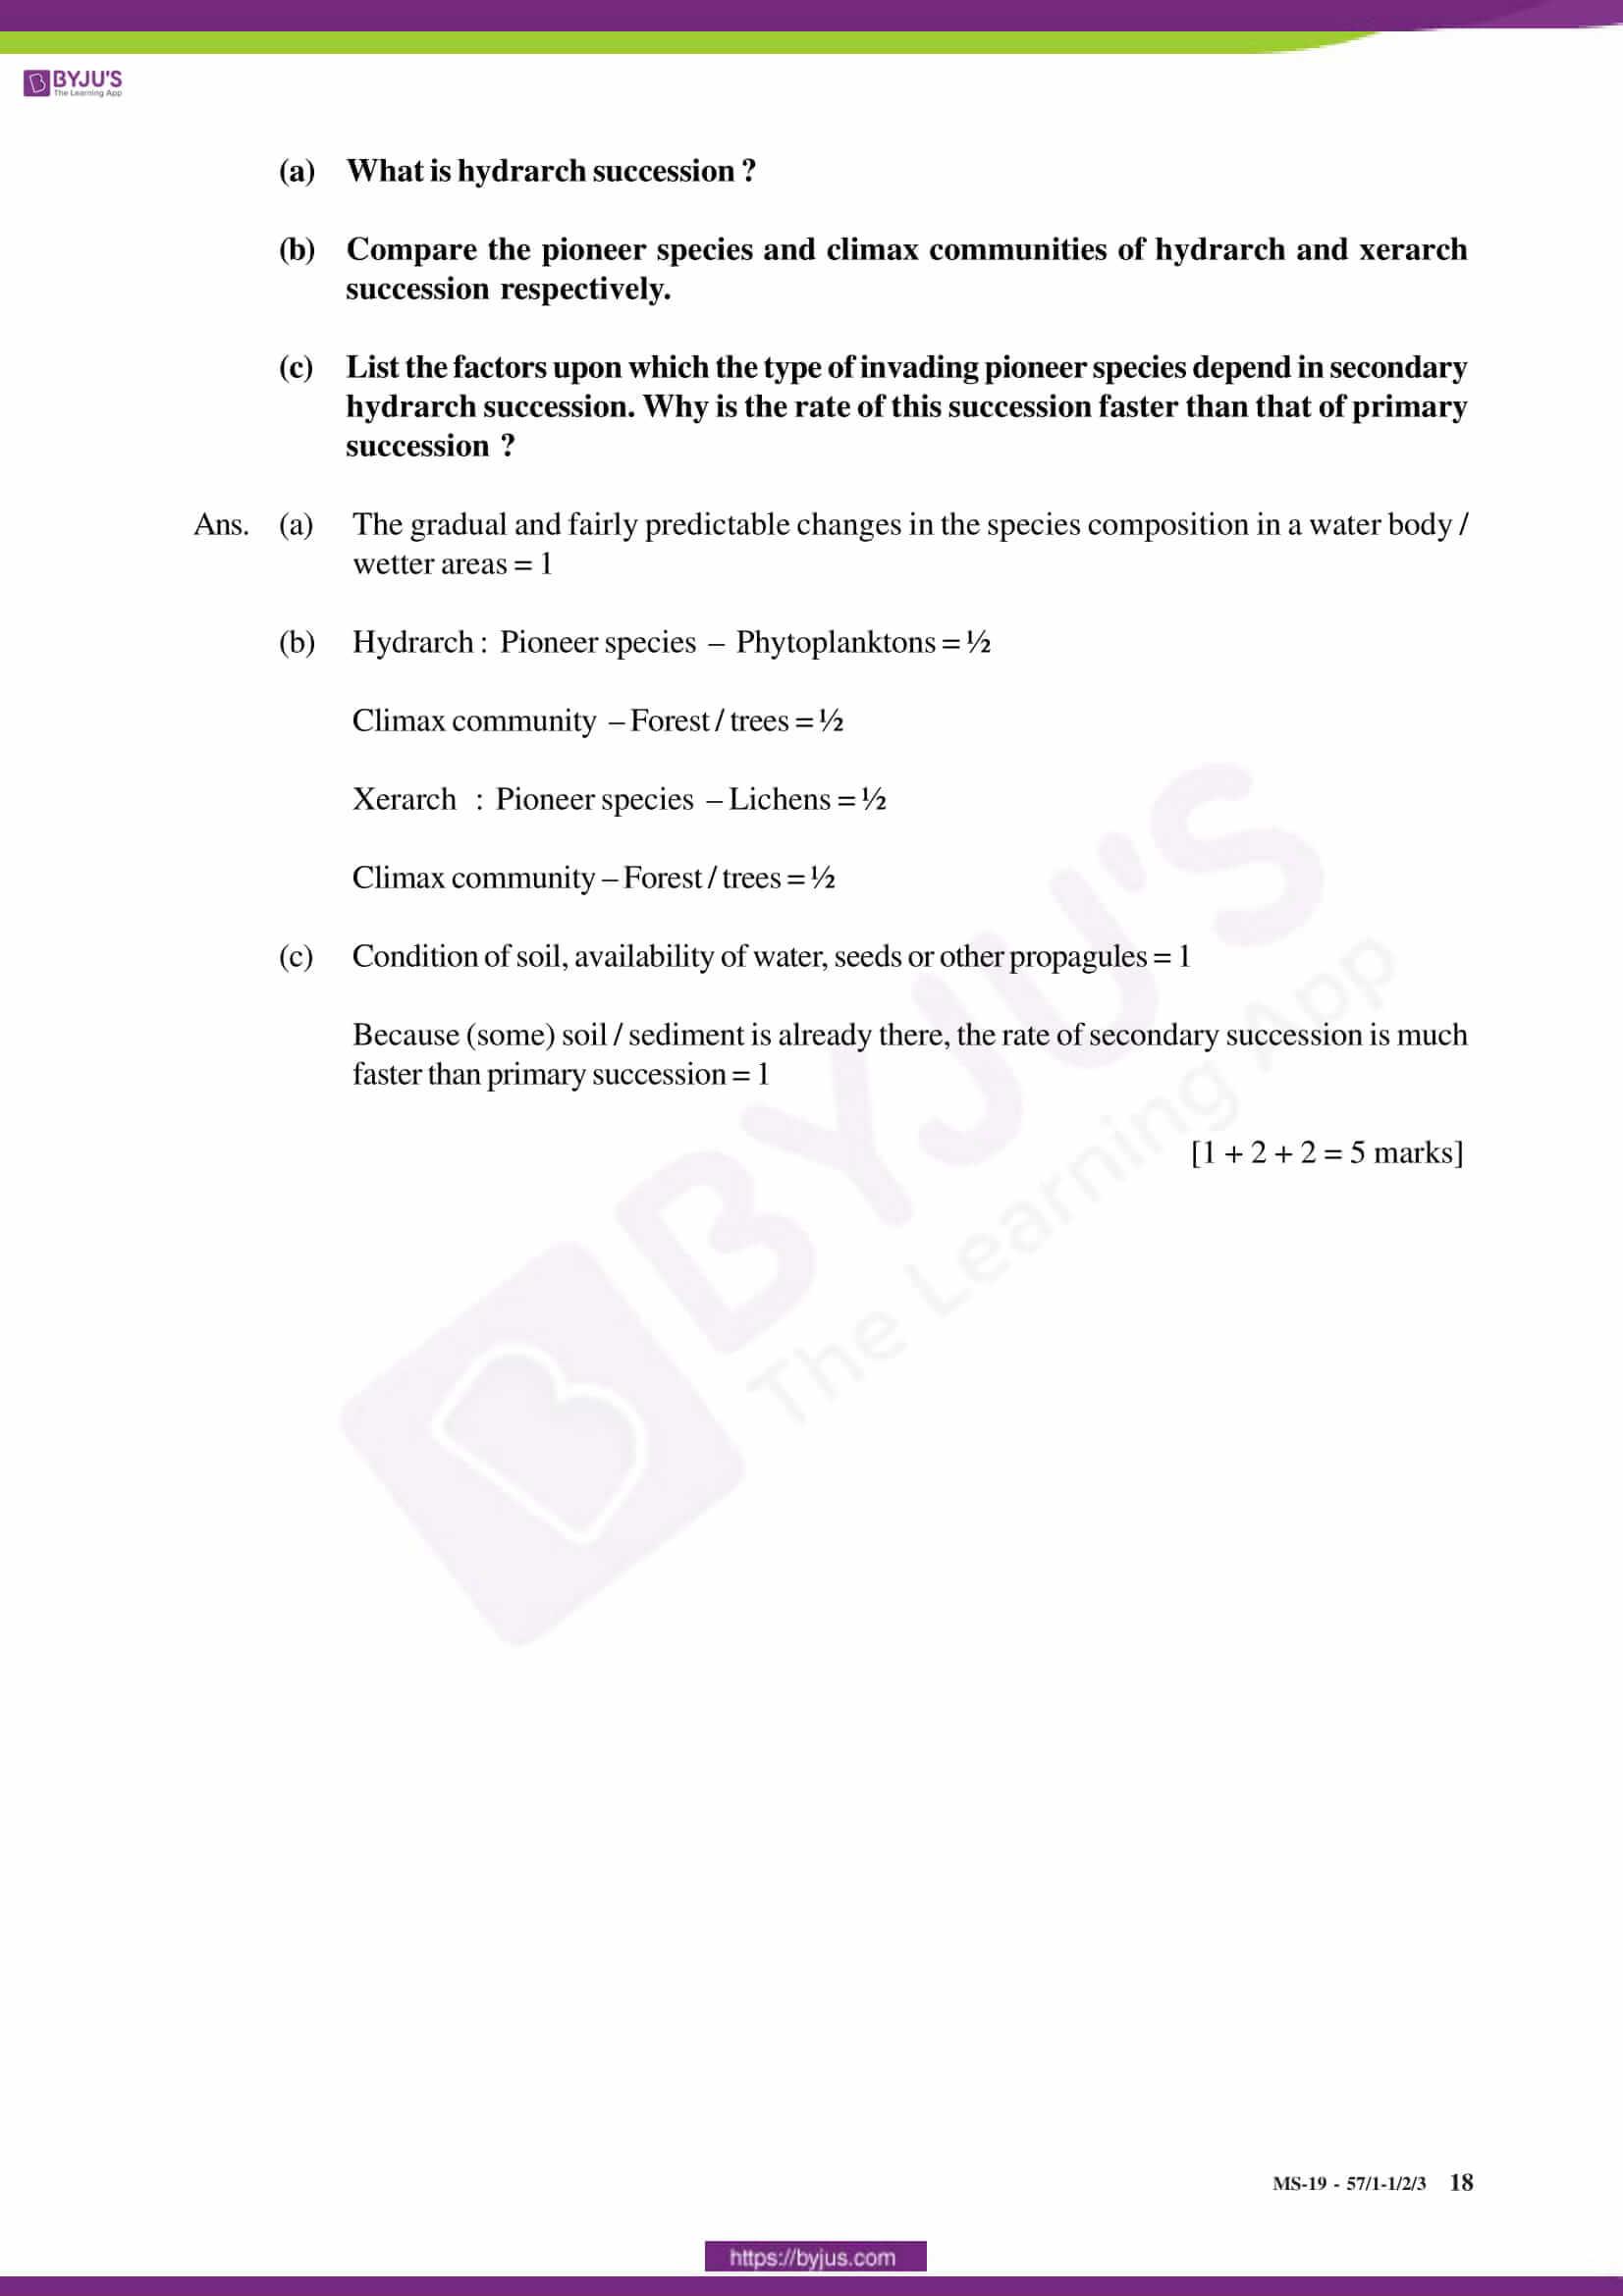 cbse class 12 solution 2019 bio set 1